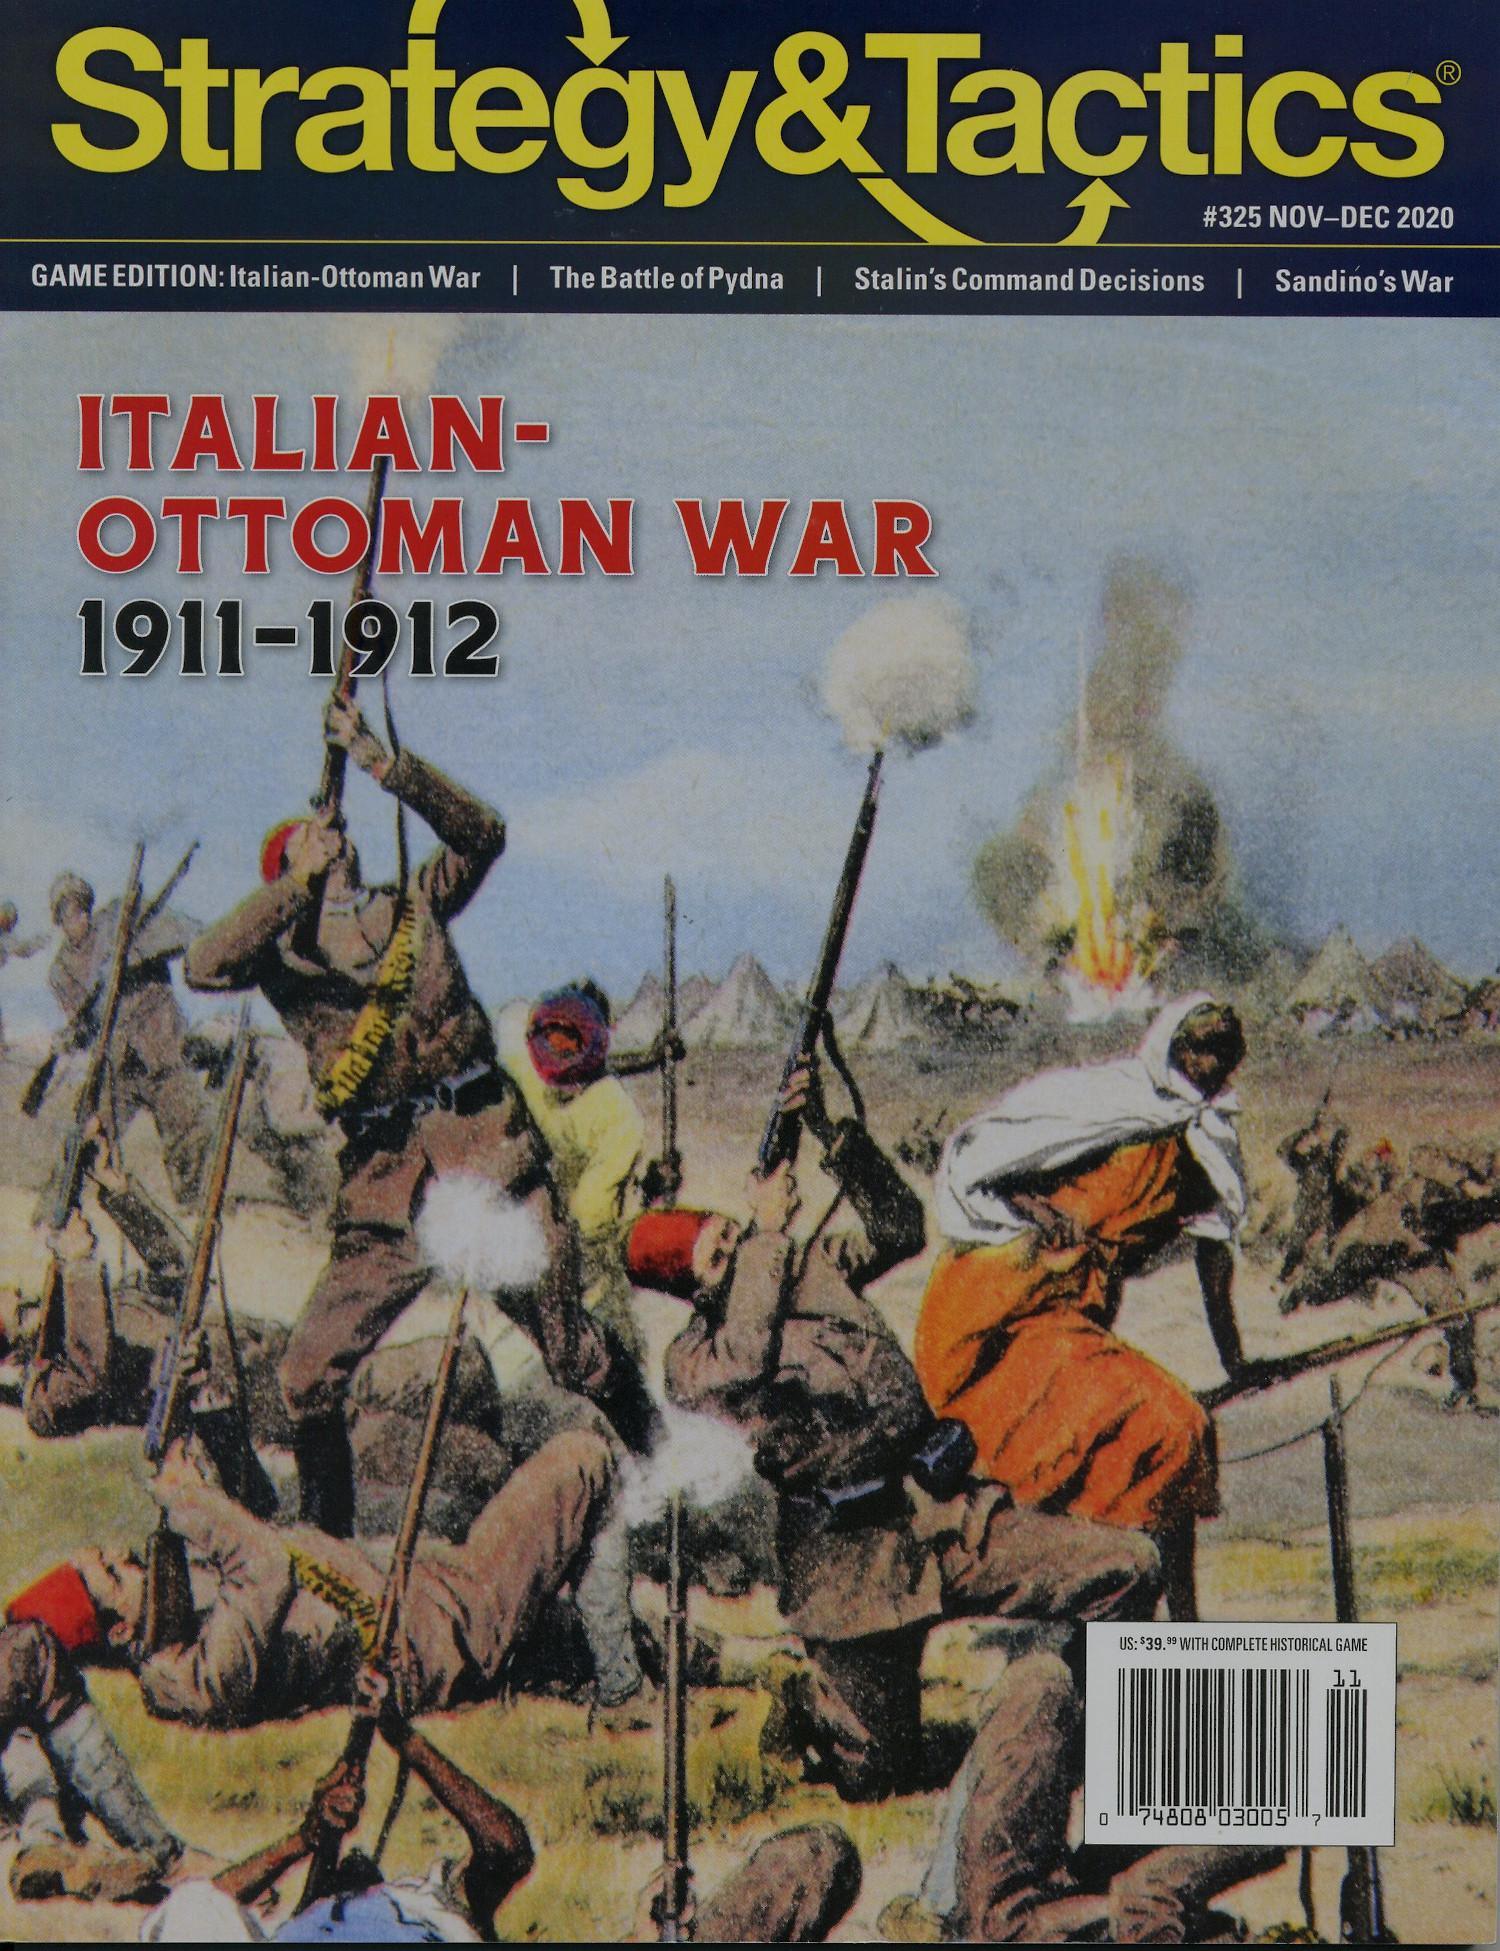 Strategy & Tactics - Game - 325 - Italian-Ottoman War - 1911-1912